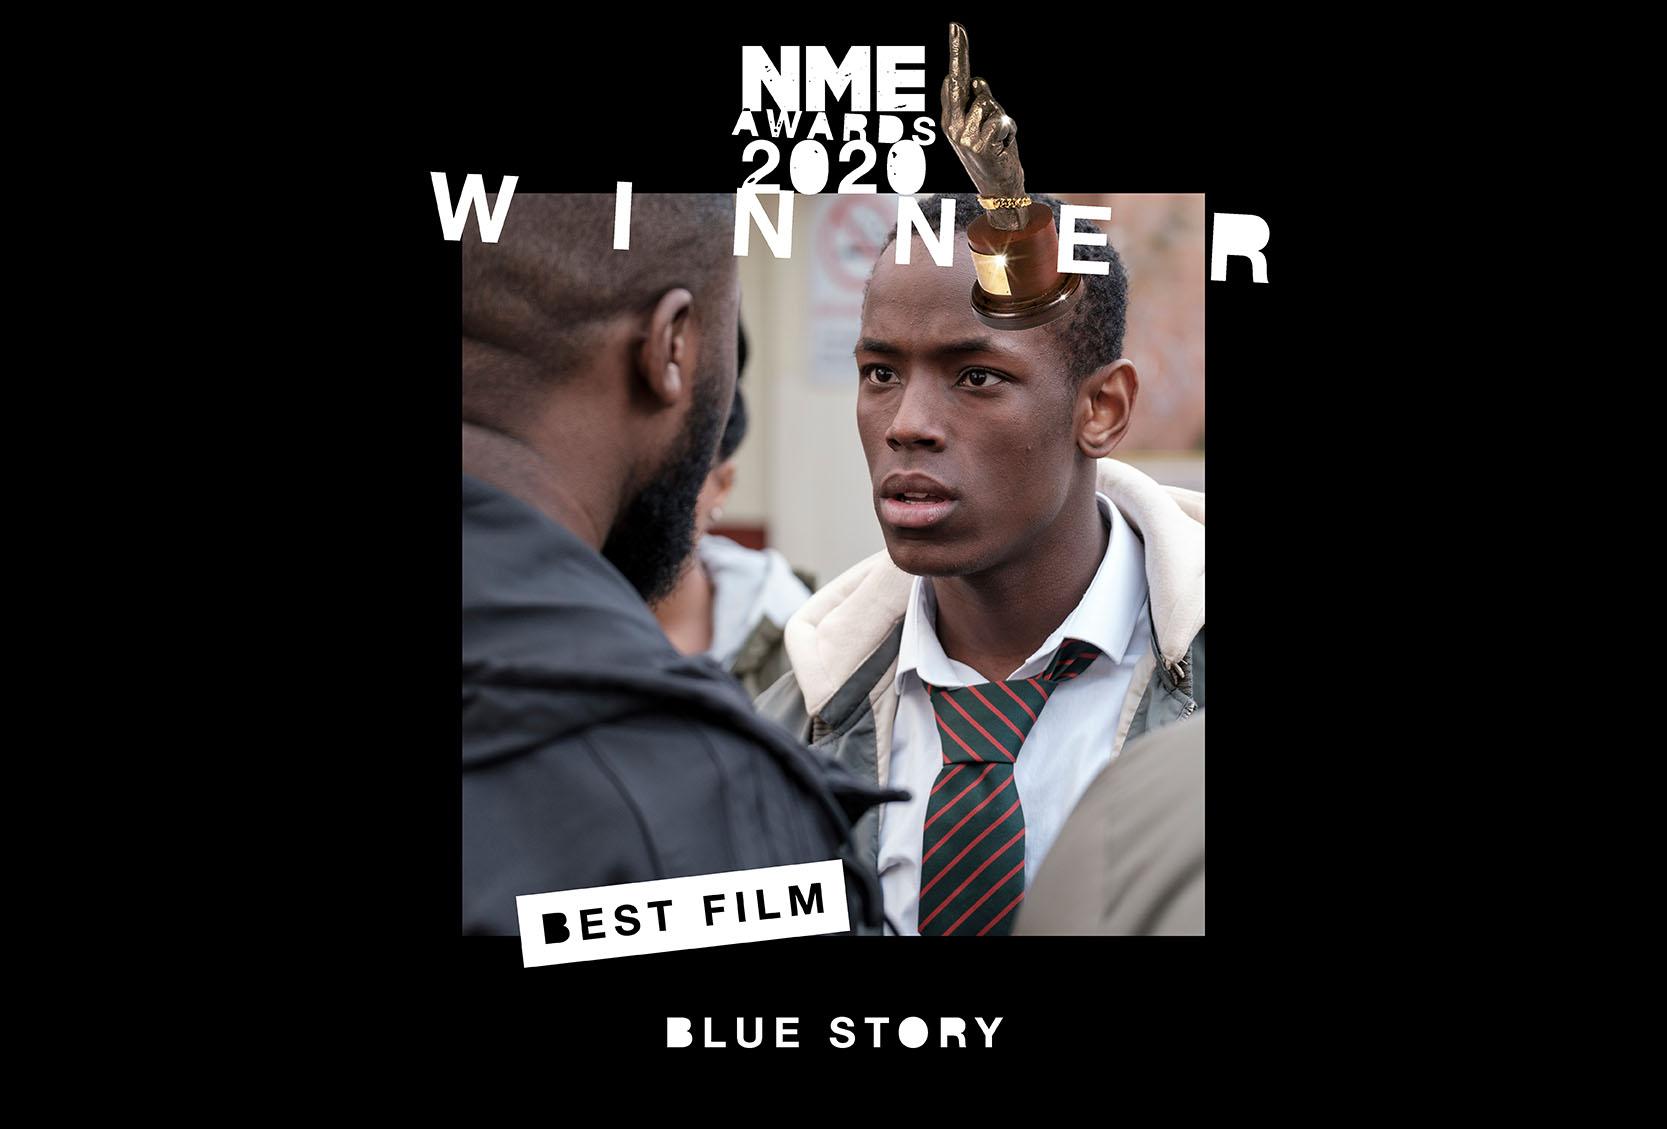 blue story nme awards 2020